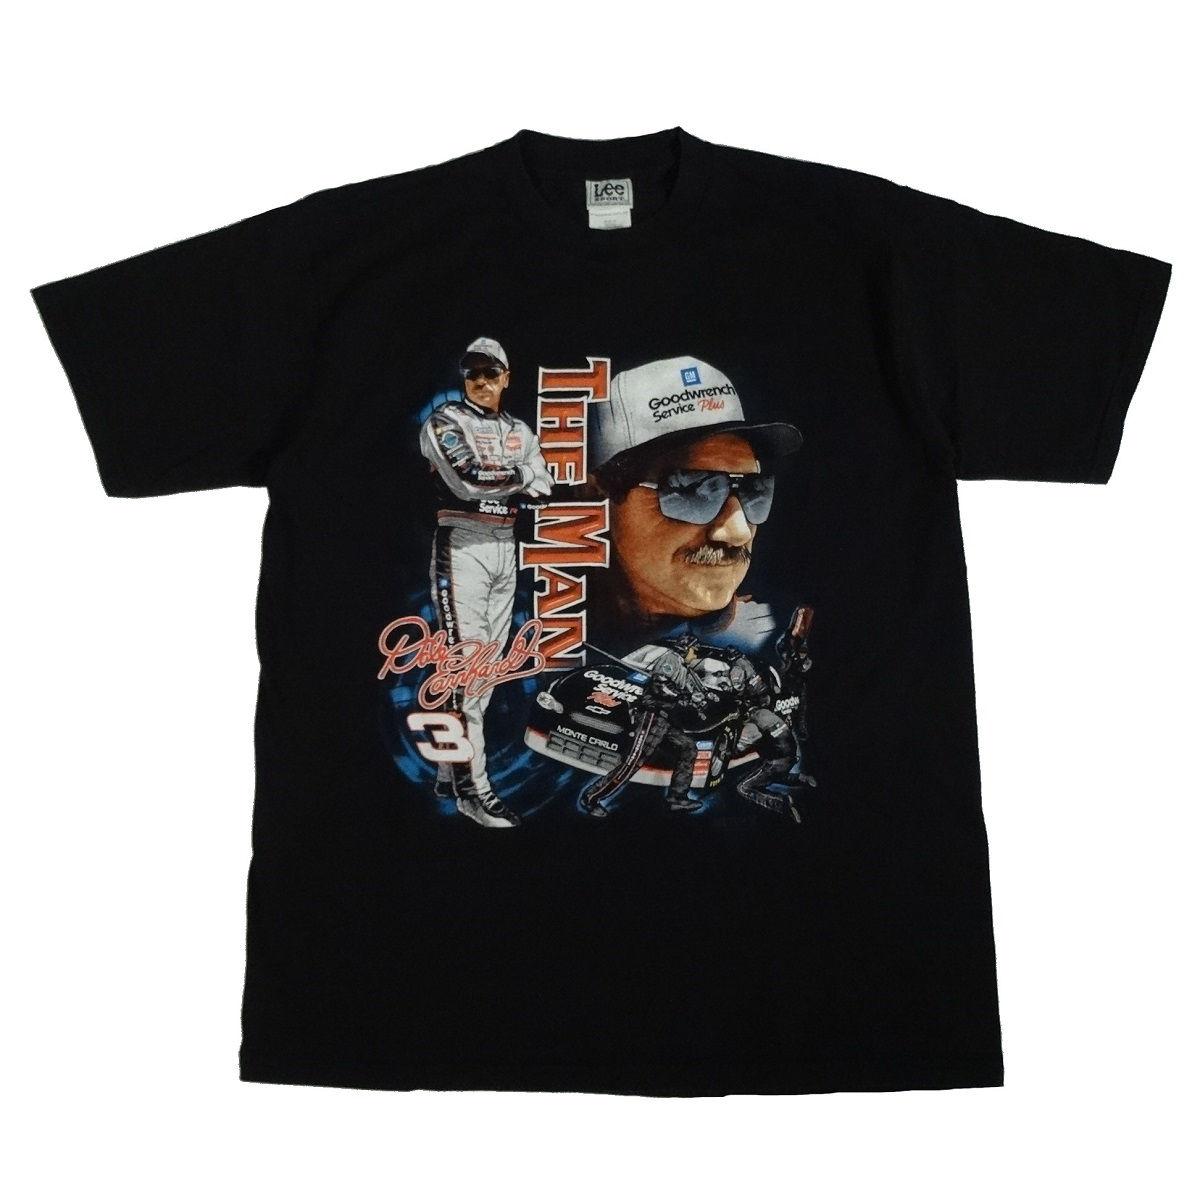 dale earnhardt the man vintage 2001 t shirt front